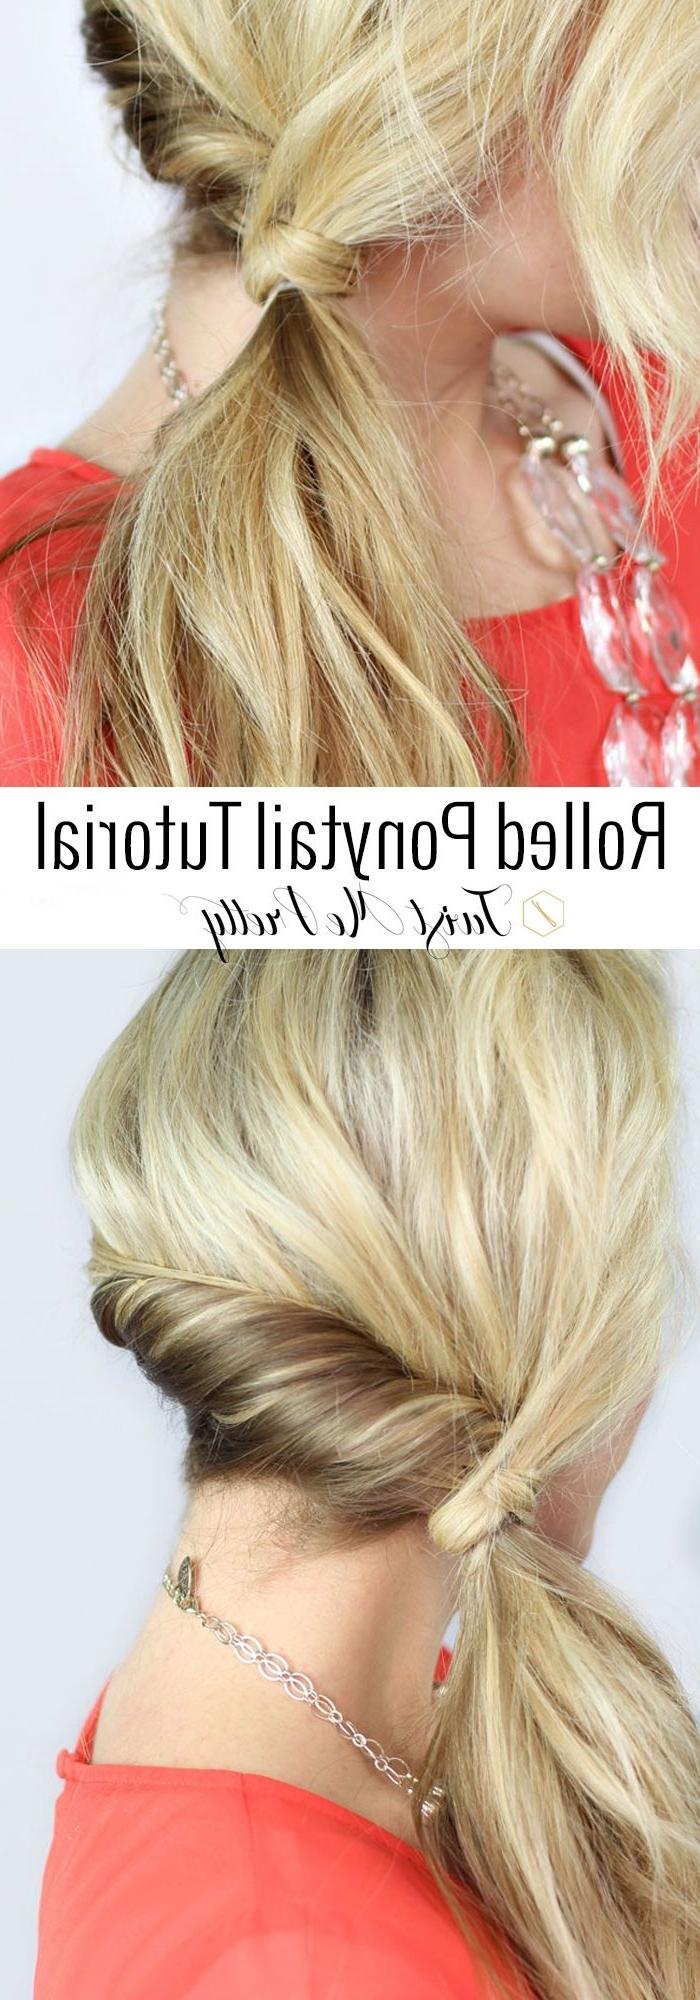 Hair Styles, Hair (View 11 of 20)